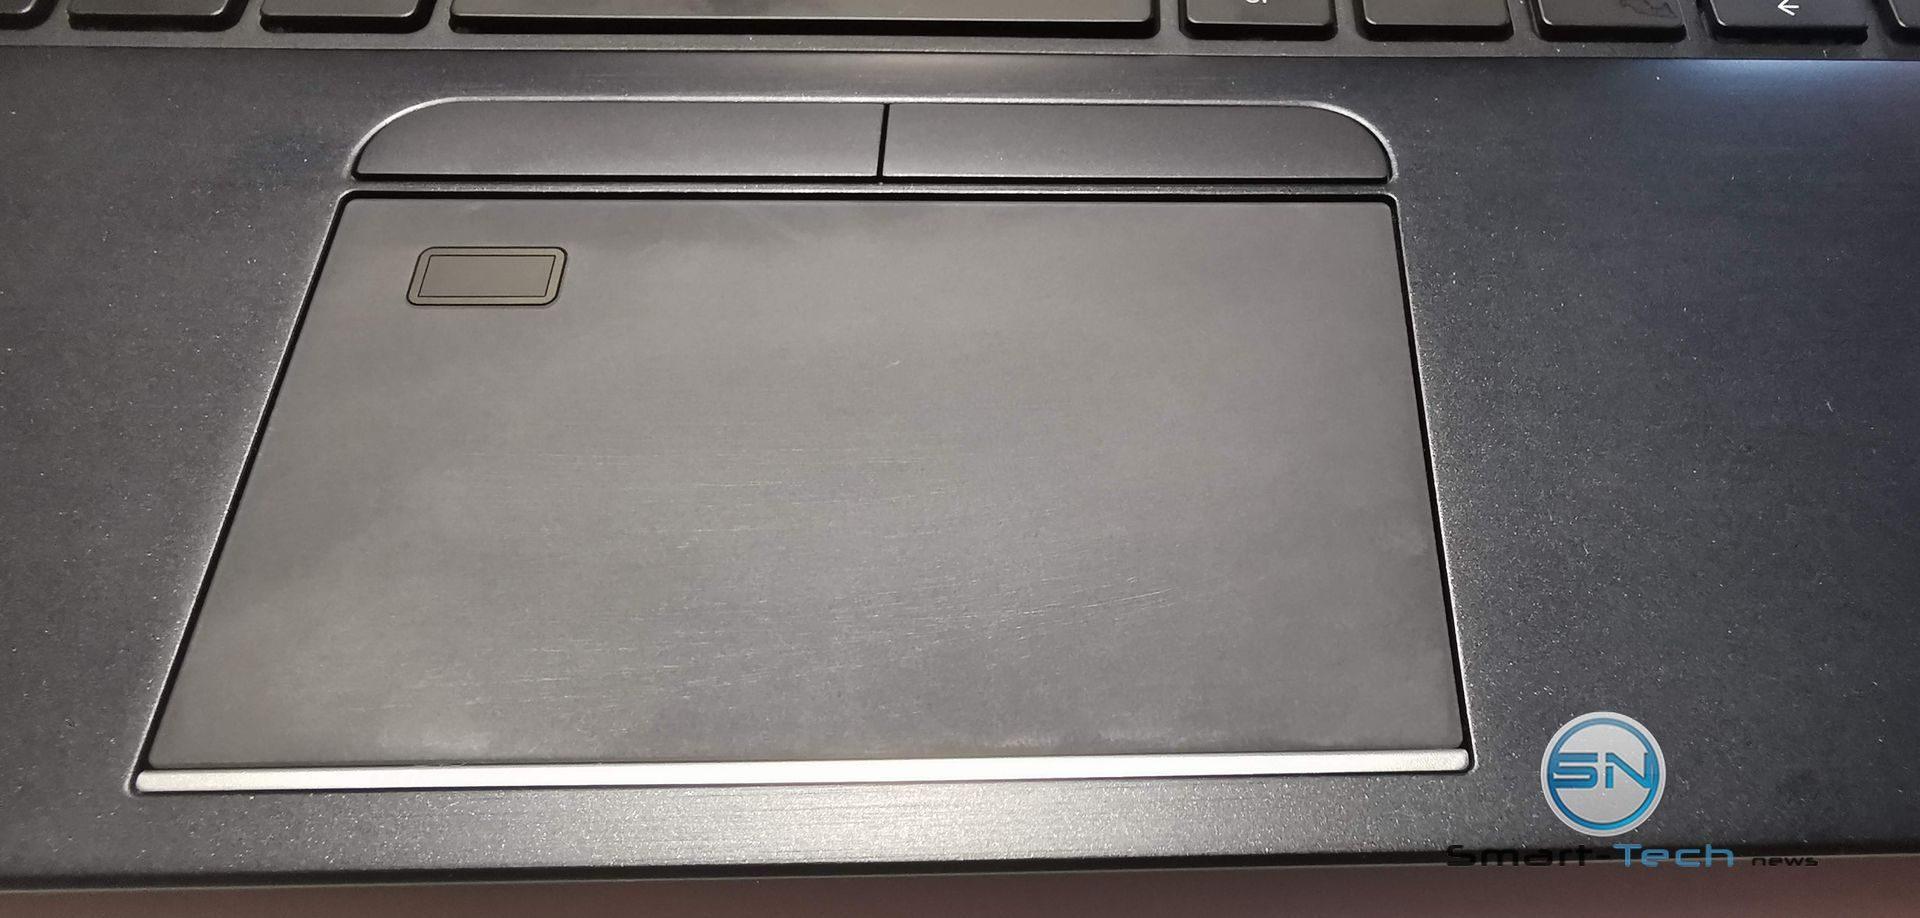 Touch Trackpad - Toshiba Tecra X40-E-10w - SmartTechNews